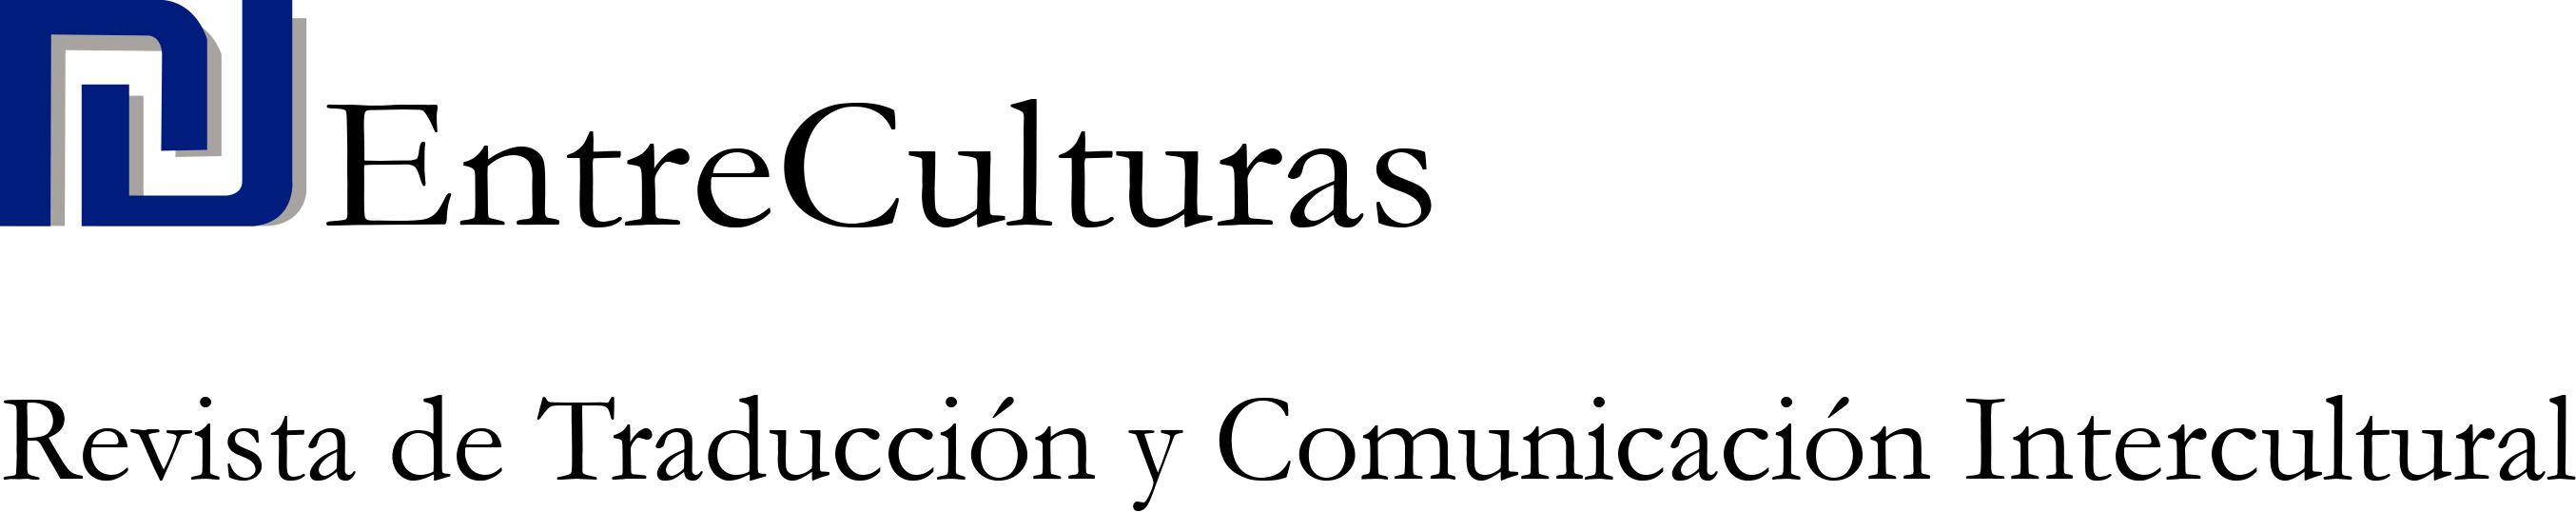 ENTRECULTURAS